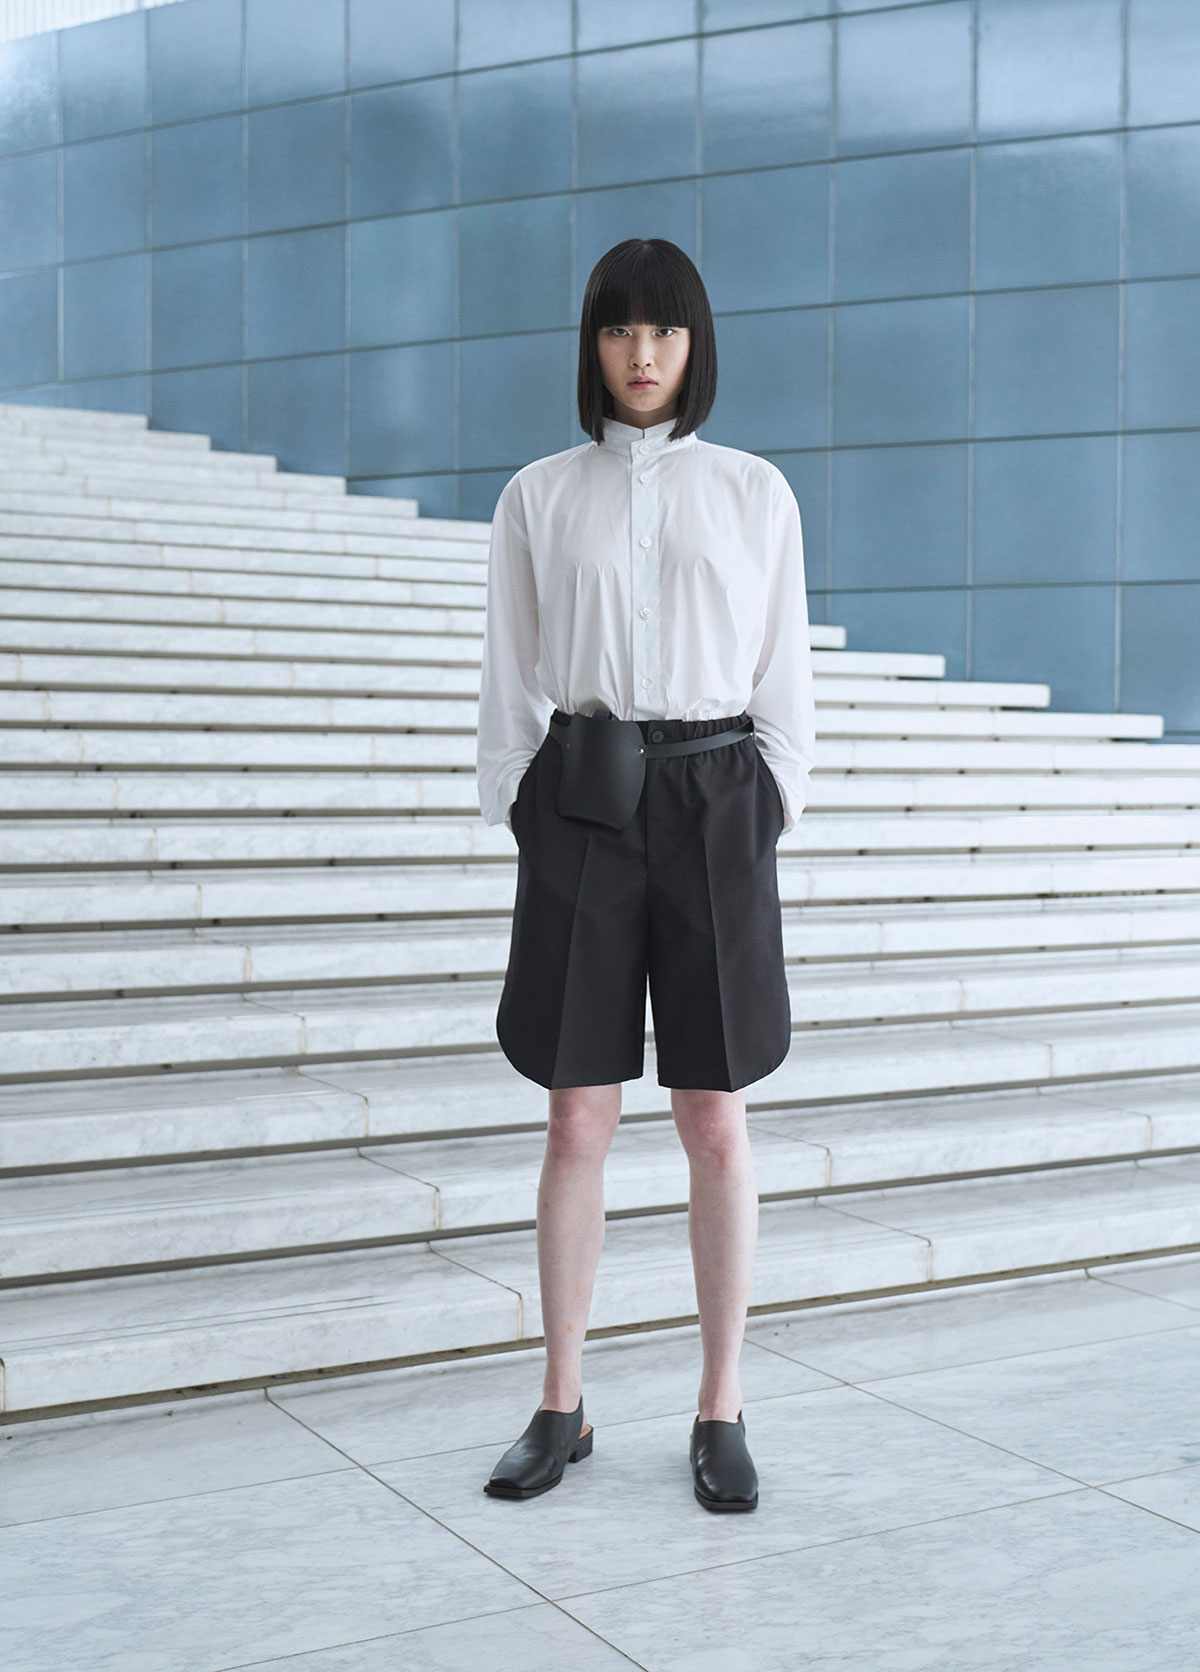 Issey Miyake Spring Summer 2022 Collection